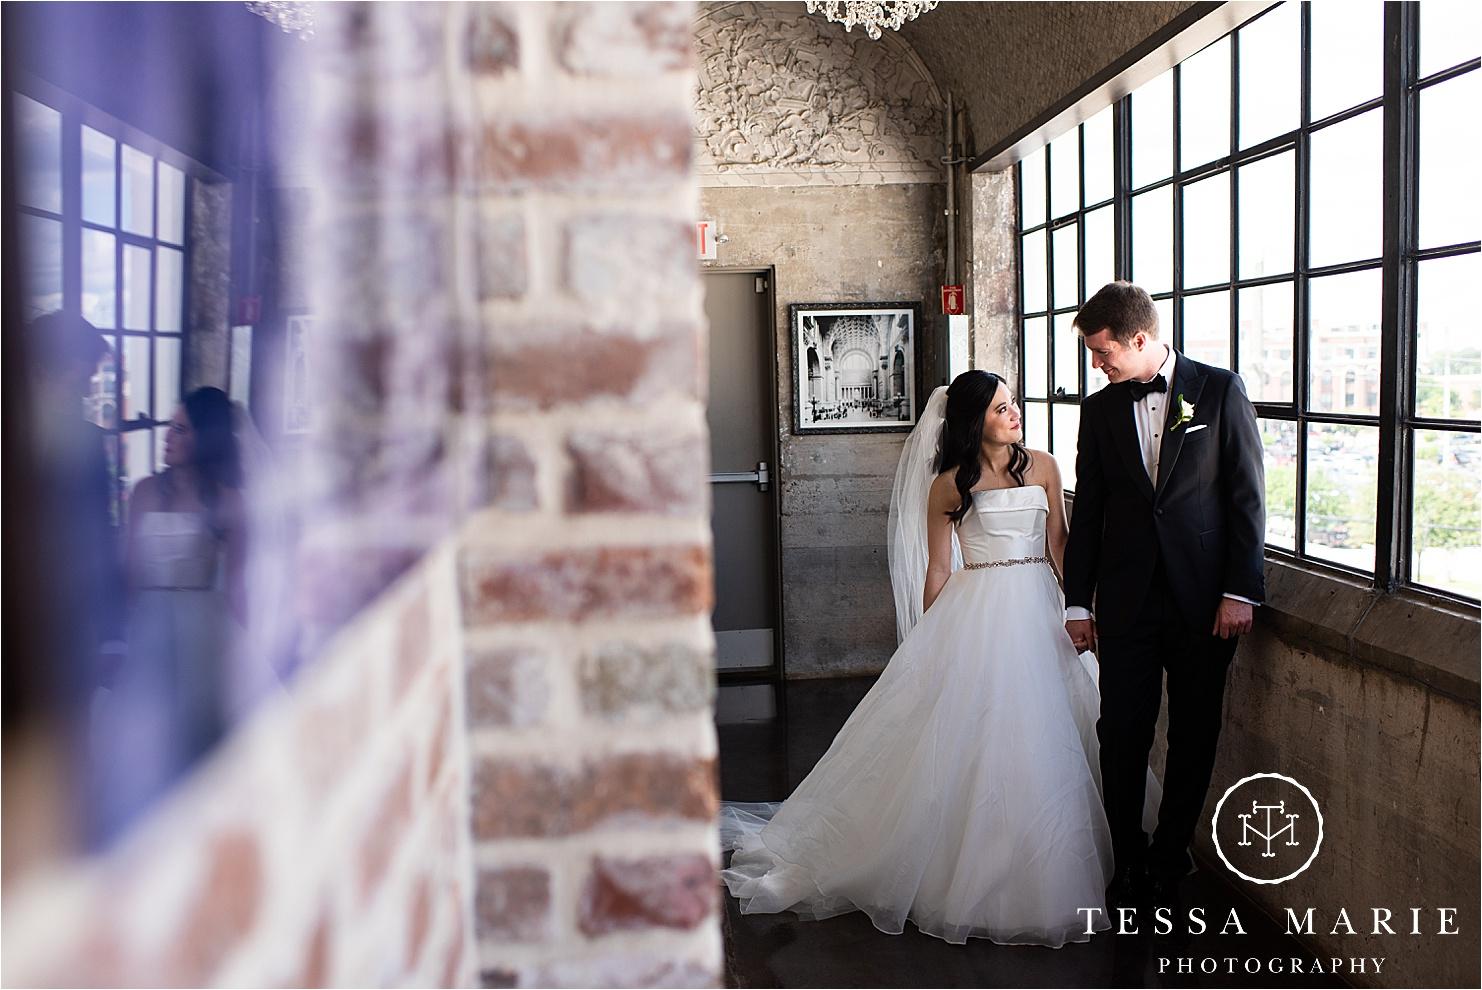 Tessa_marie_weddings_houston_wedding_photographer_The_astorian_0060.jpg